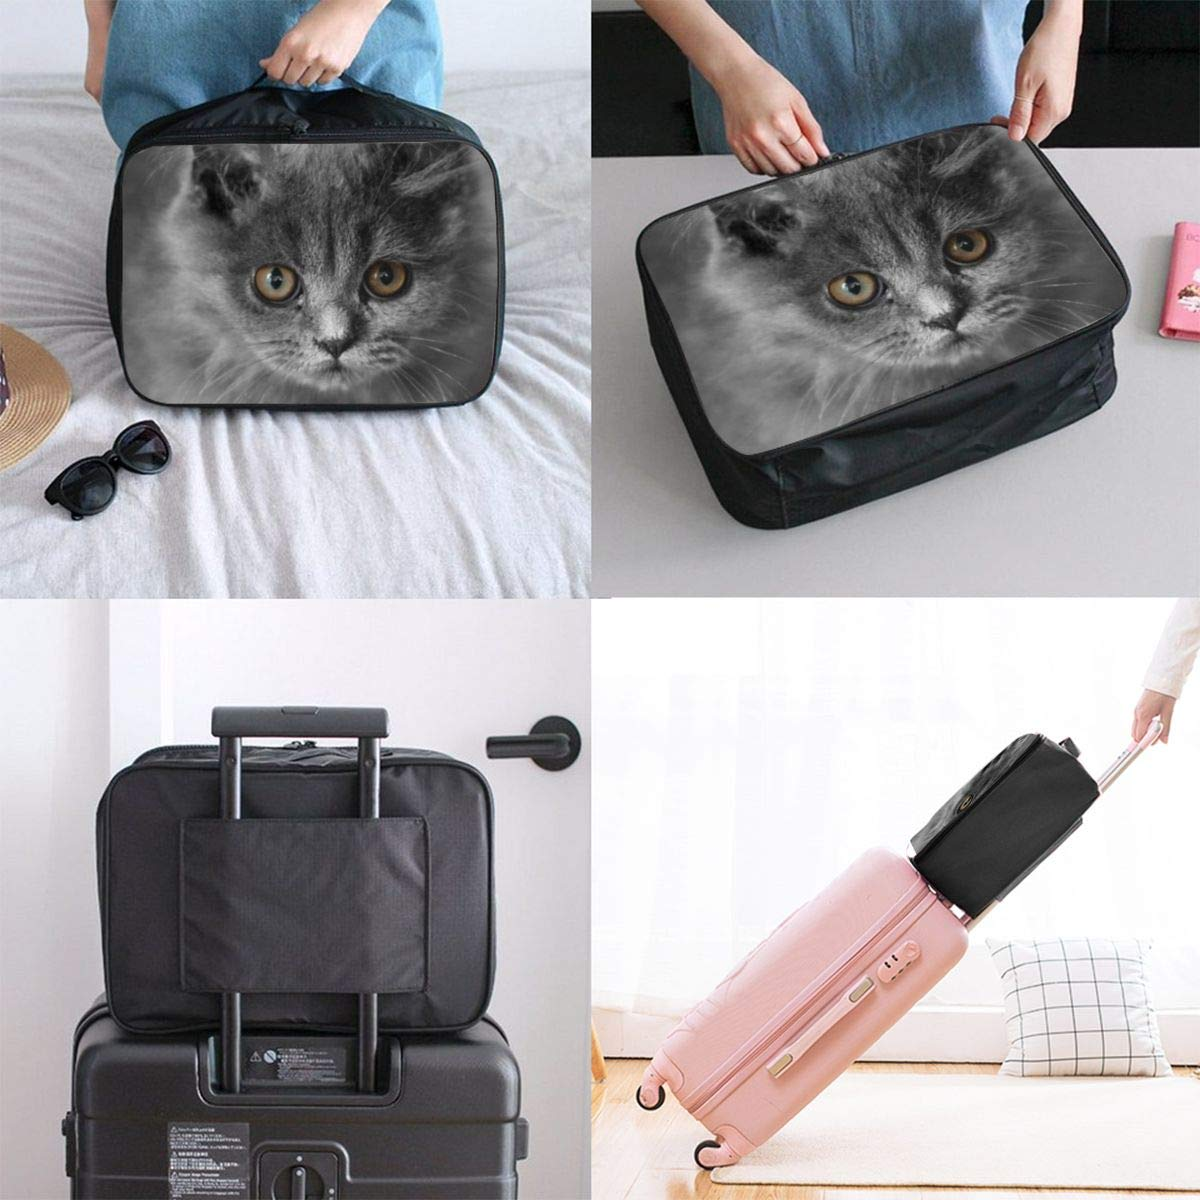 ADGAI Cats Animals Kittens Canvas Travel Weekender Bag,Fashion Custom Lightweight Large Capacity Portable Luggage Bag,Suitcase Trolley Bag